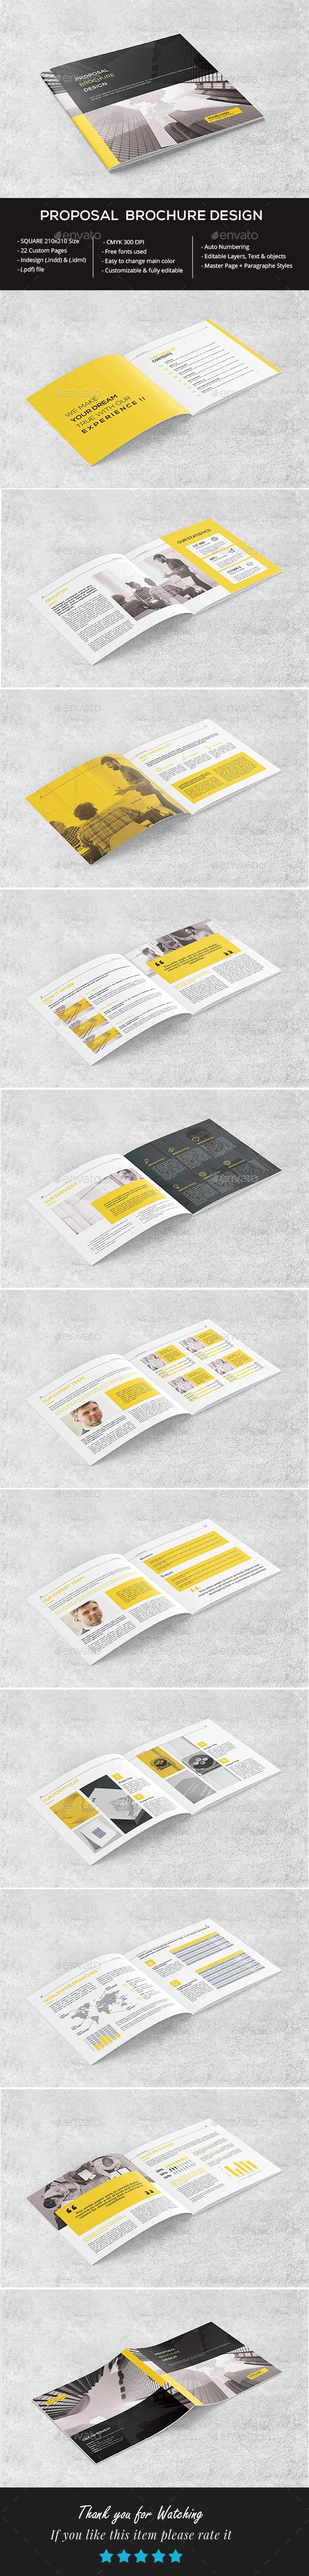 Square Clean Proposal Brochure - Brochures Print Templates